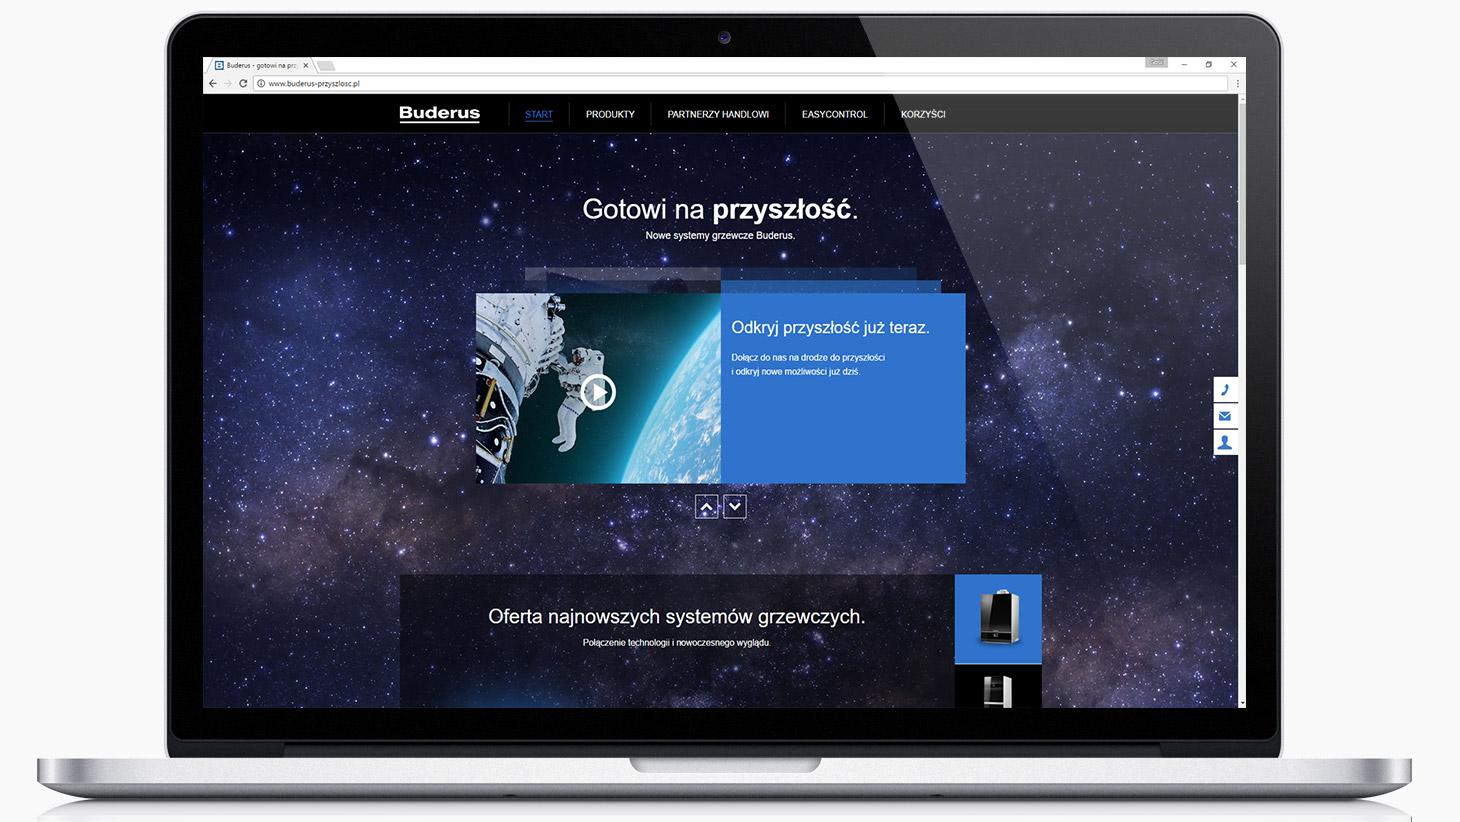 buderus-przyszlosc | tomeson.com